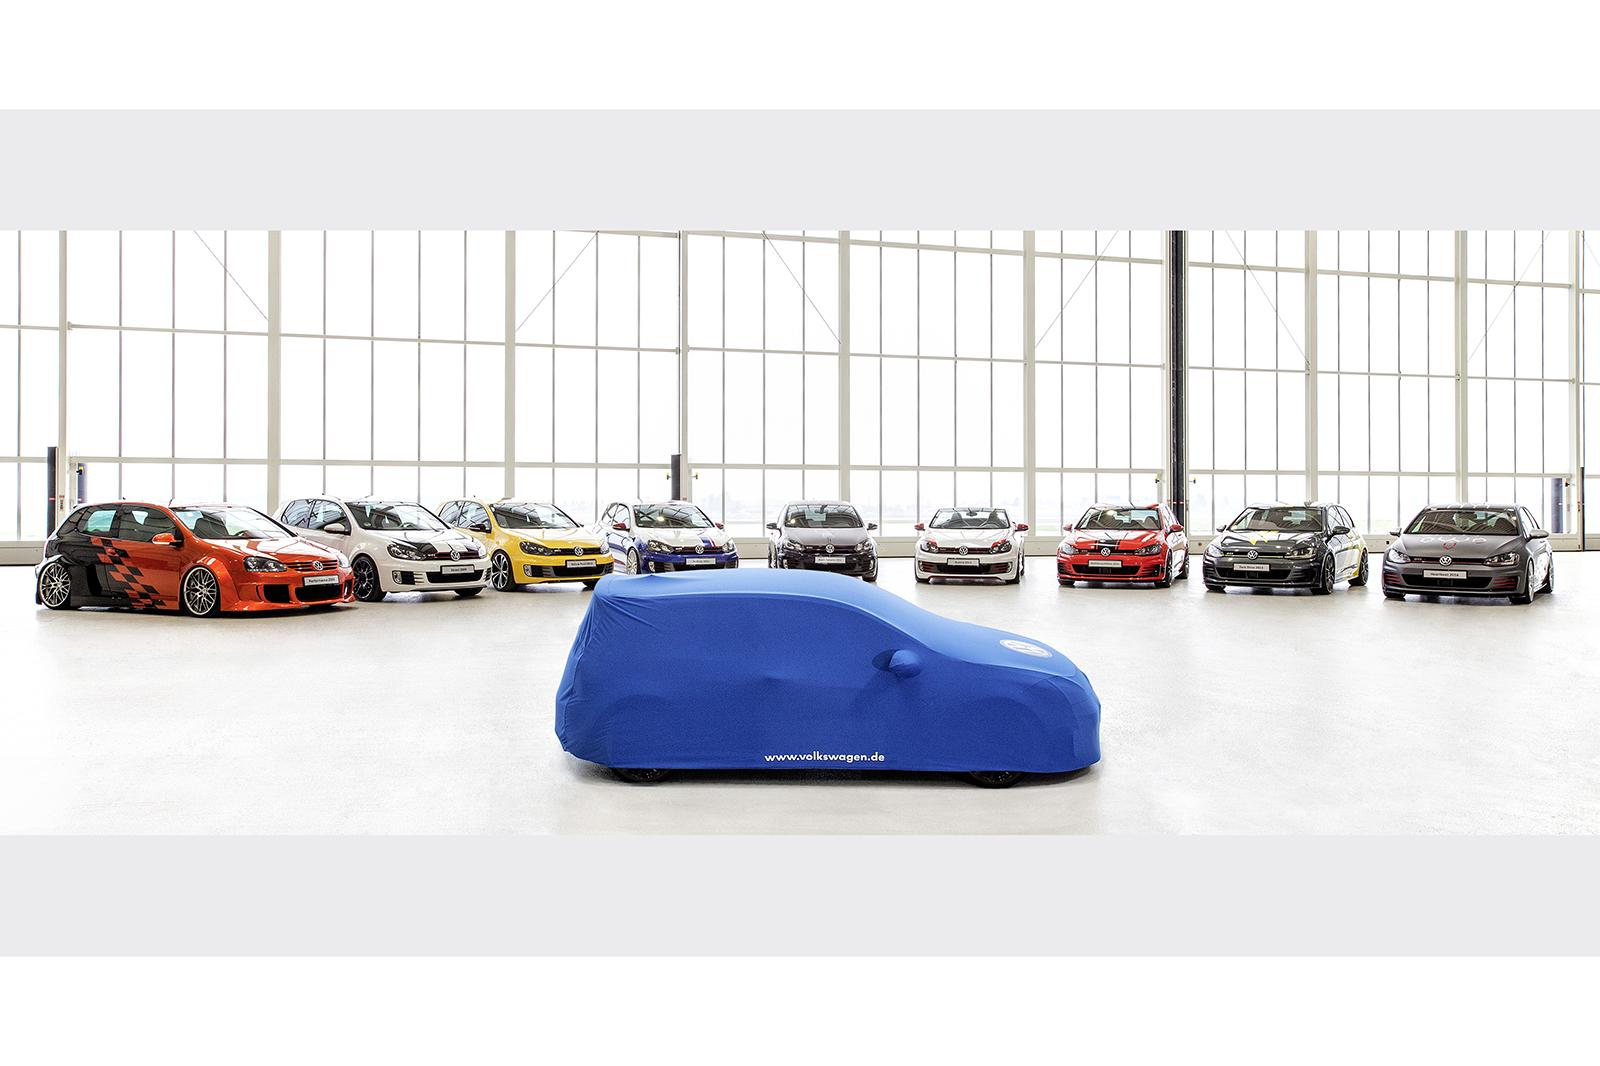 2017 Концепт Volkswagen Golf GTI Worthersee готов к раскрытию